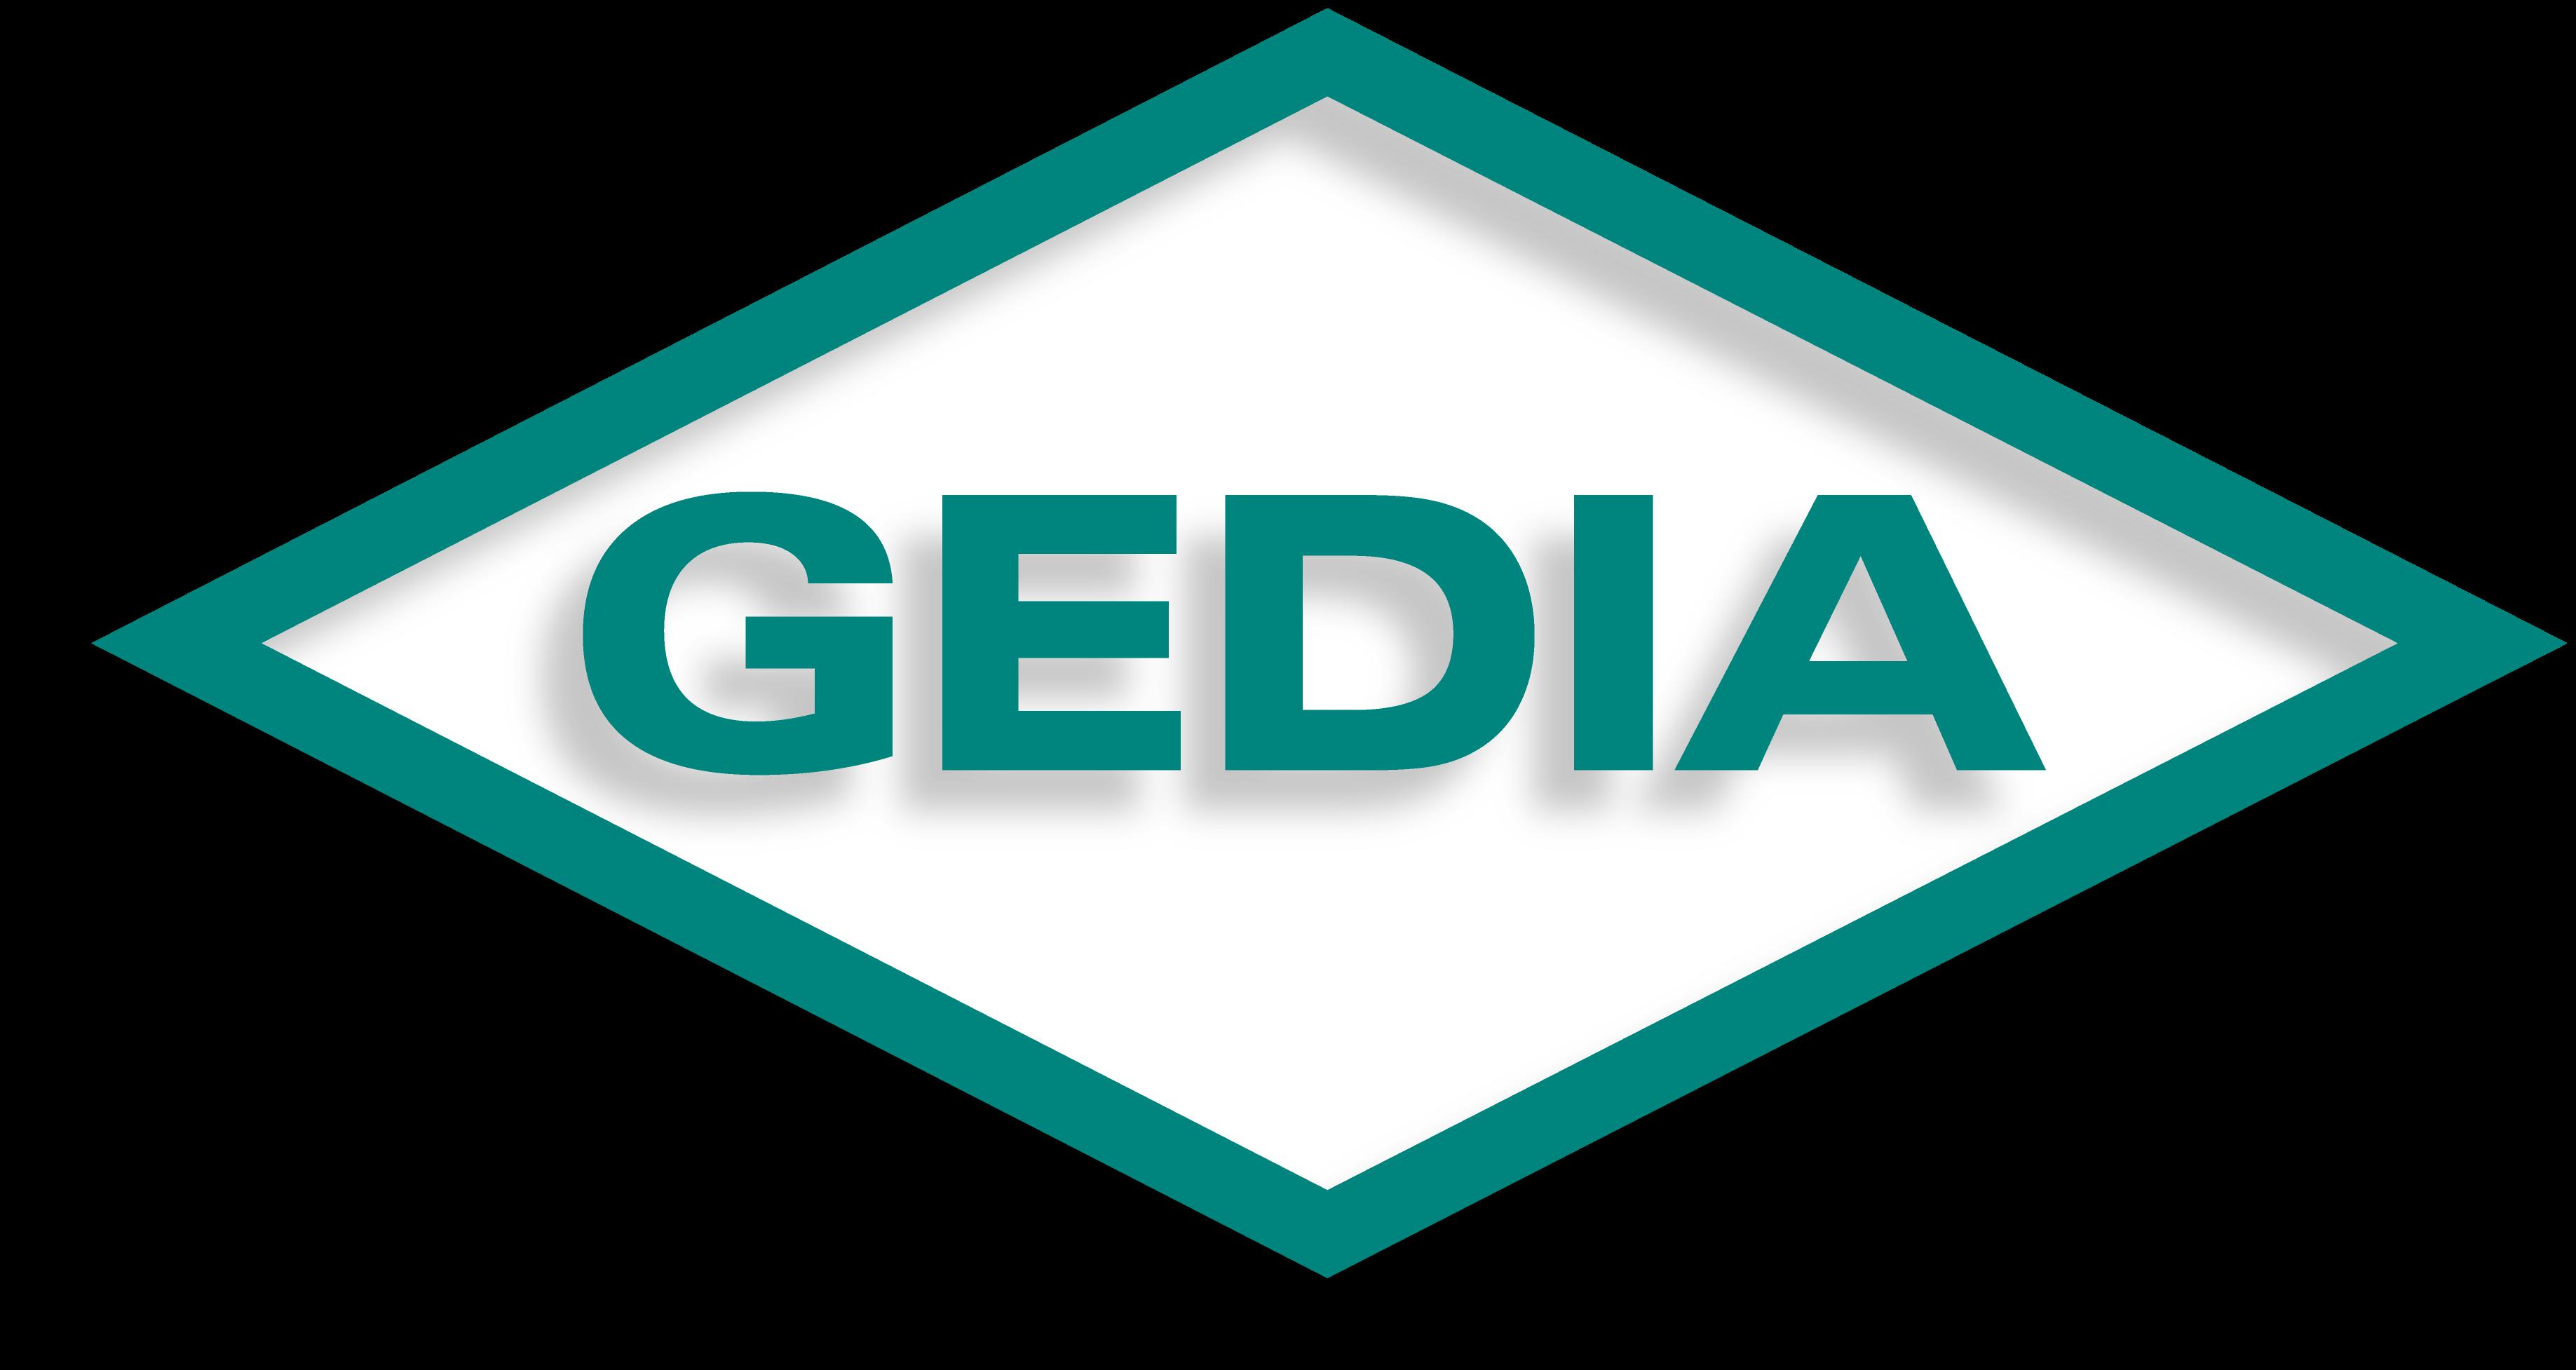 GEDIA Automotive Group